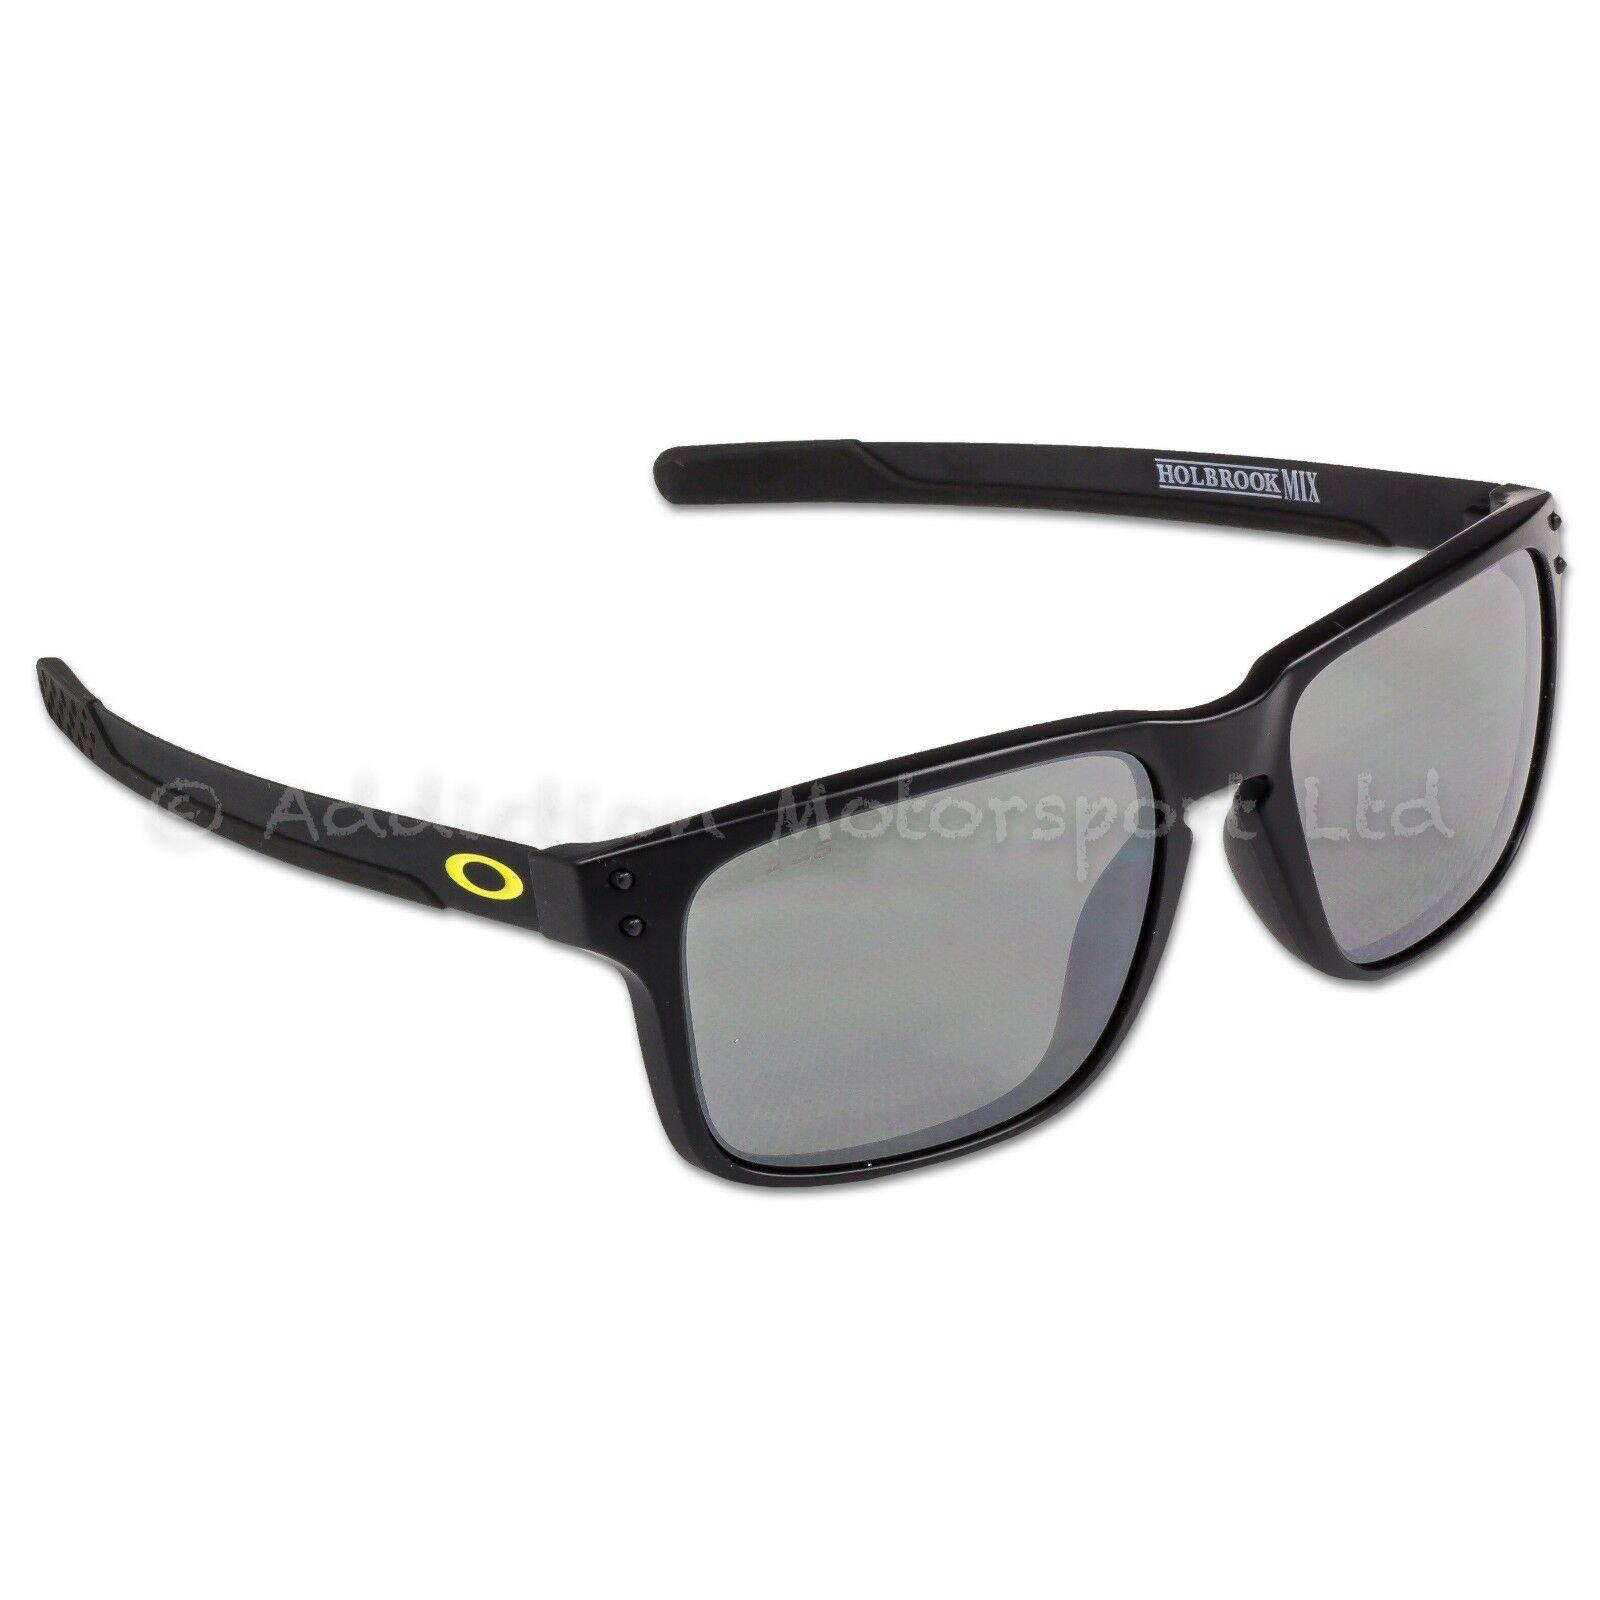 2f5f4f4988 Oakley Holbrook Mix Vr46 Valentino Rossi Sunglasses Matte Black Polarized  for sale online